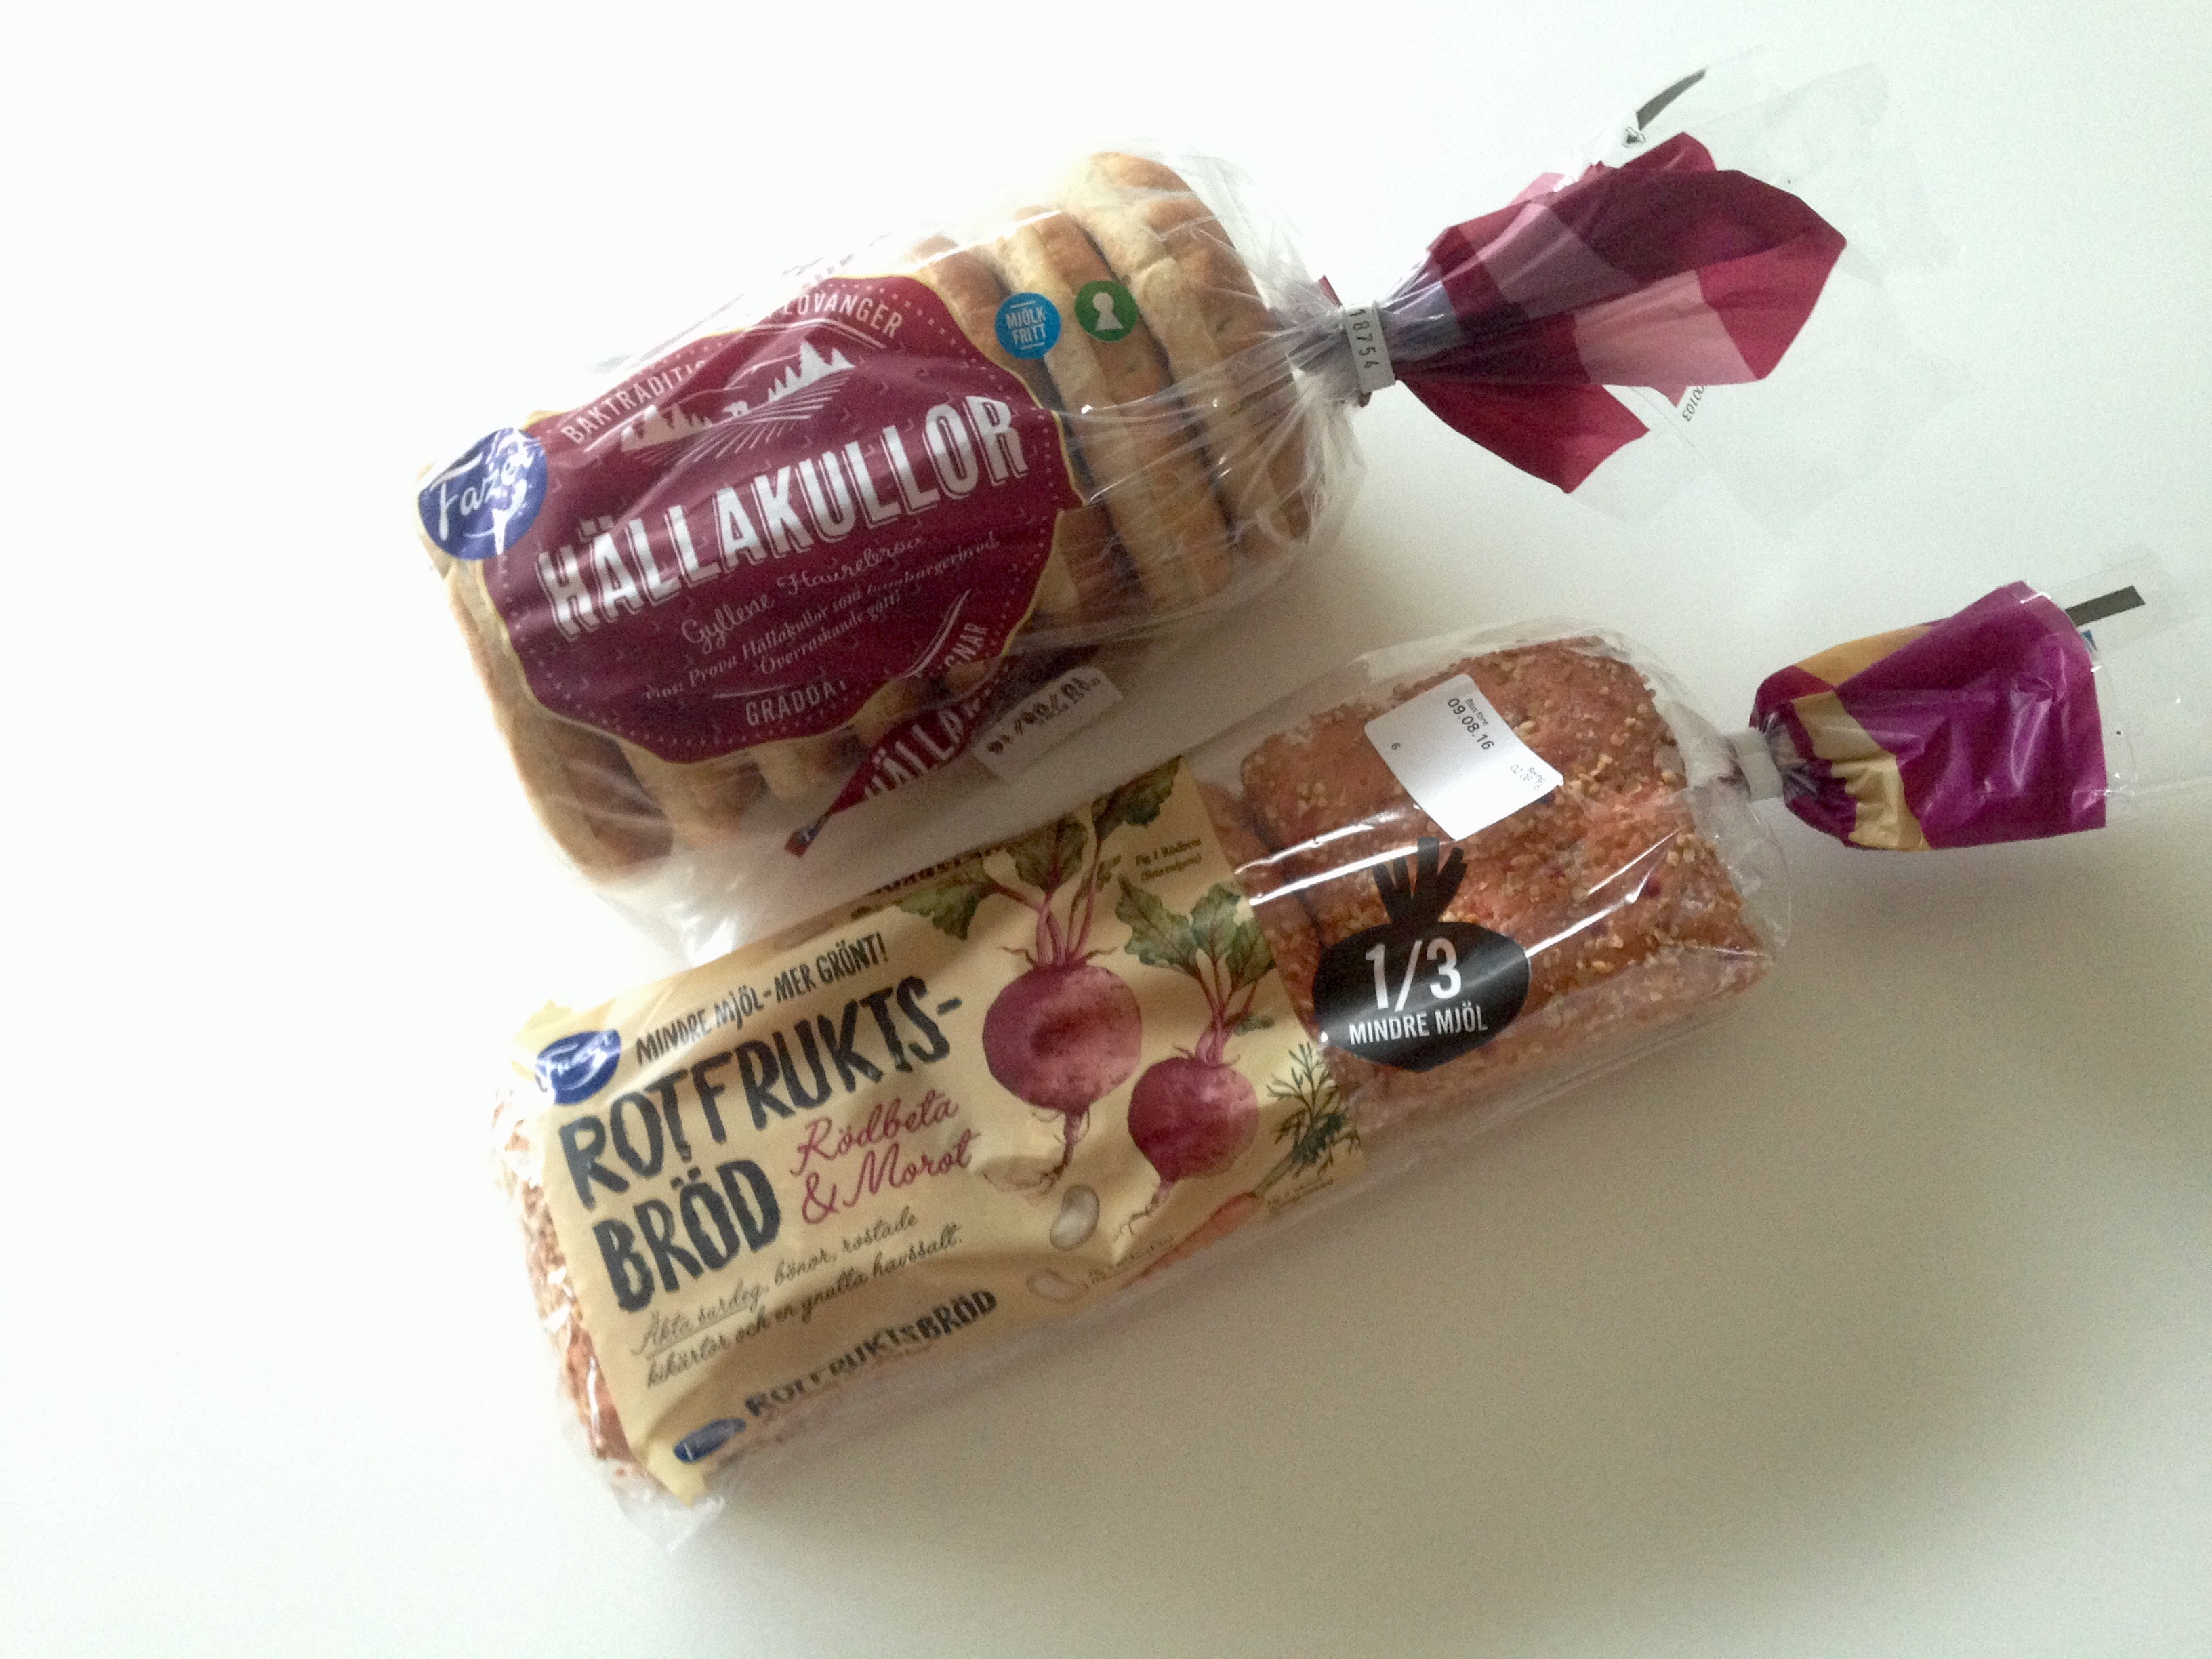 Gratis_bröd